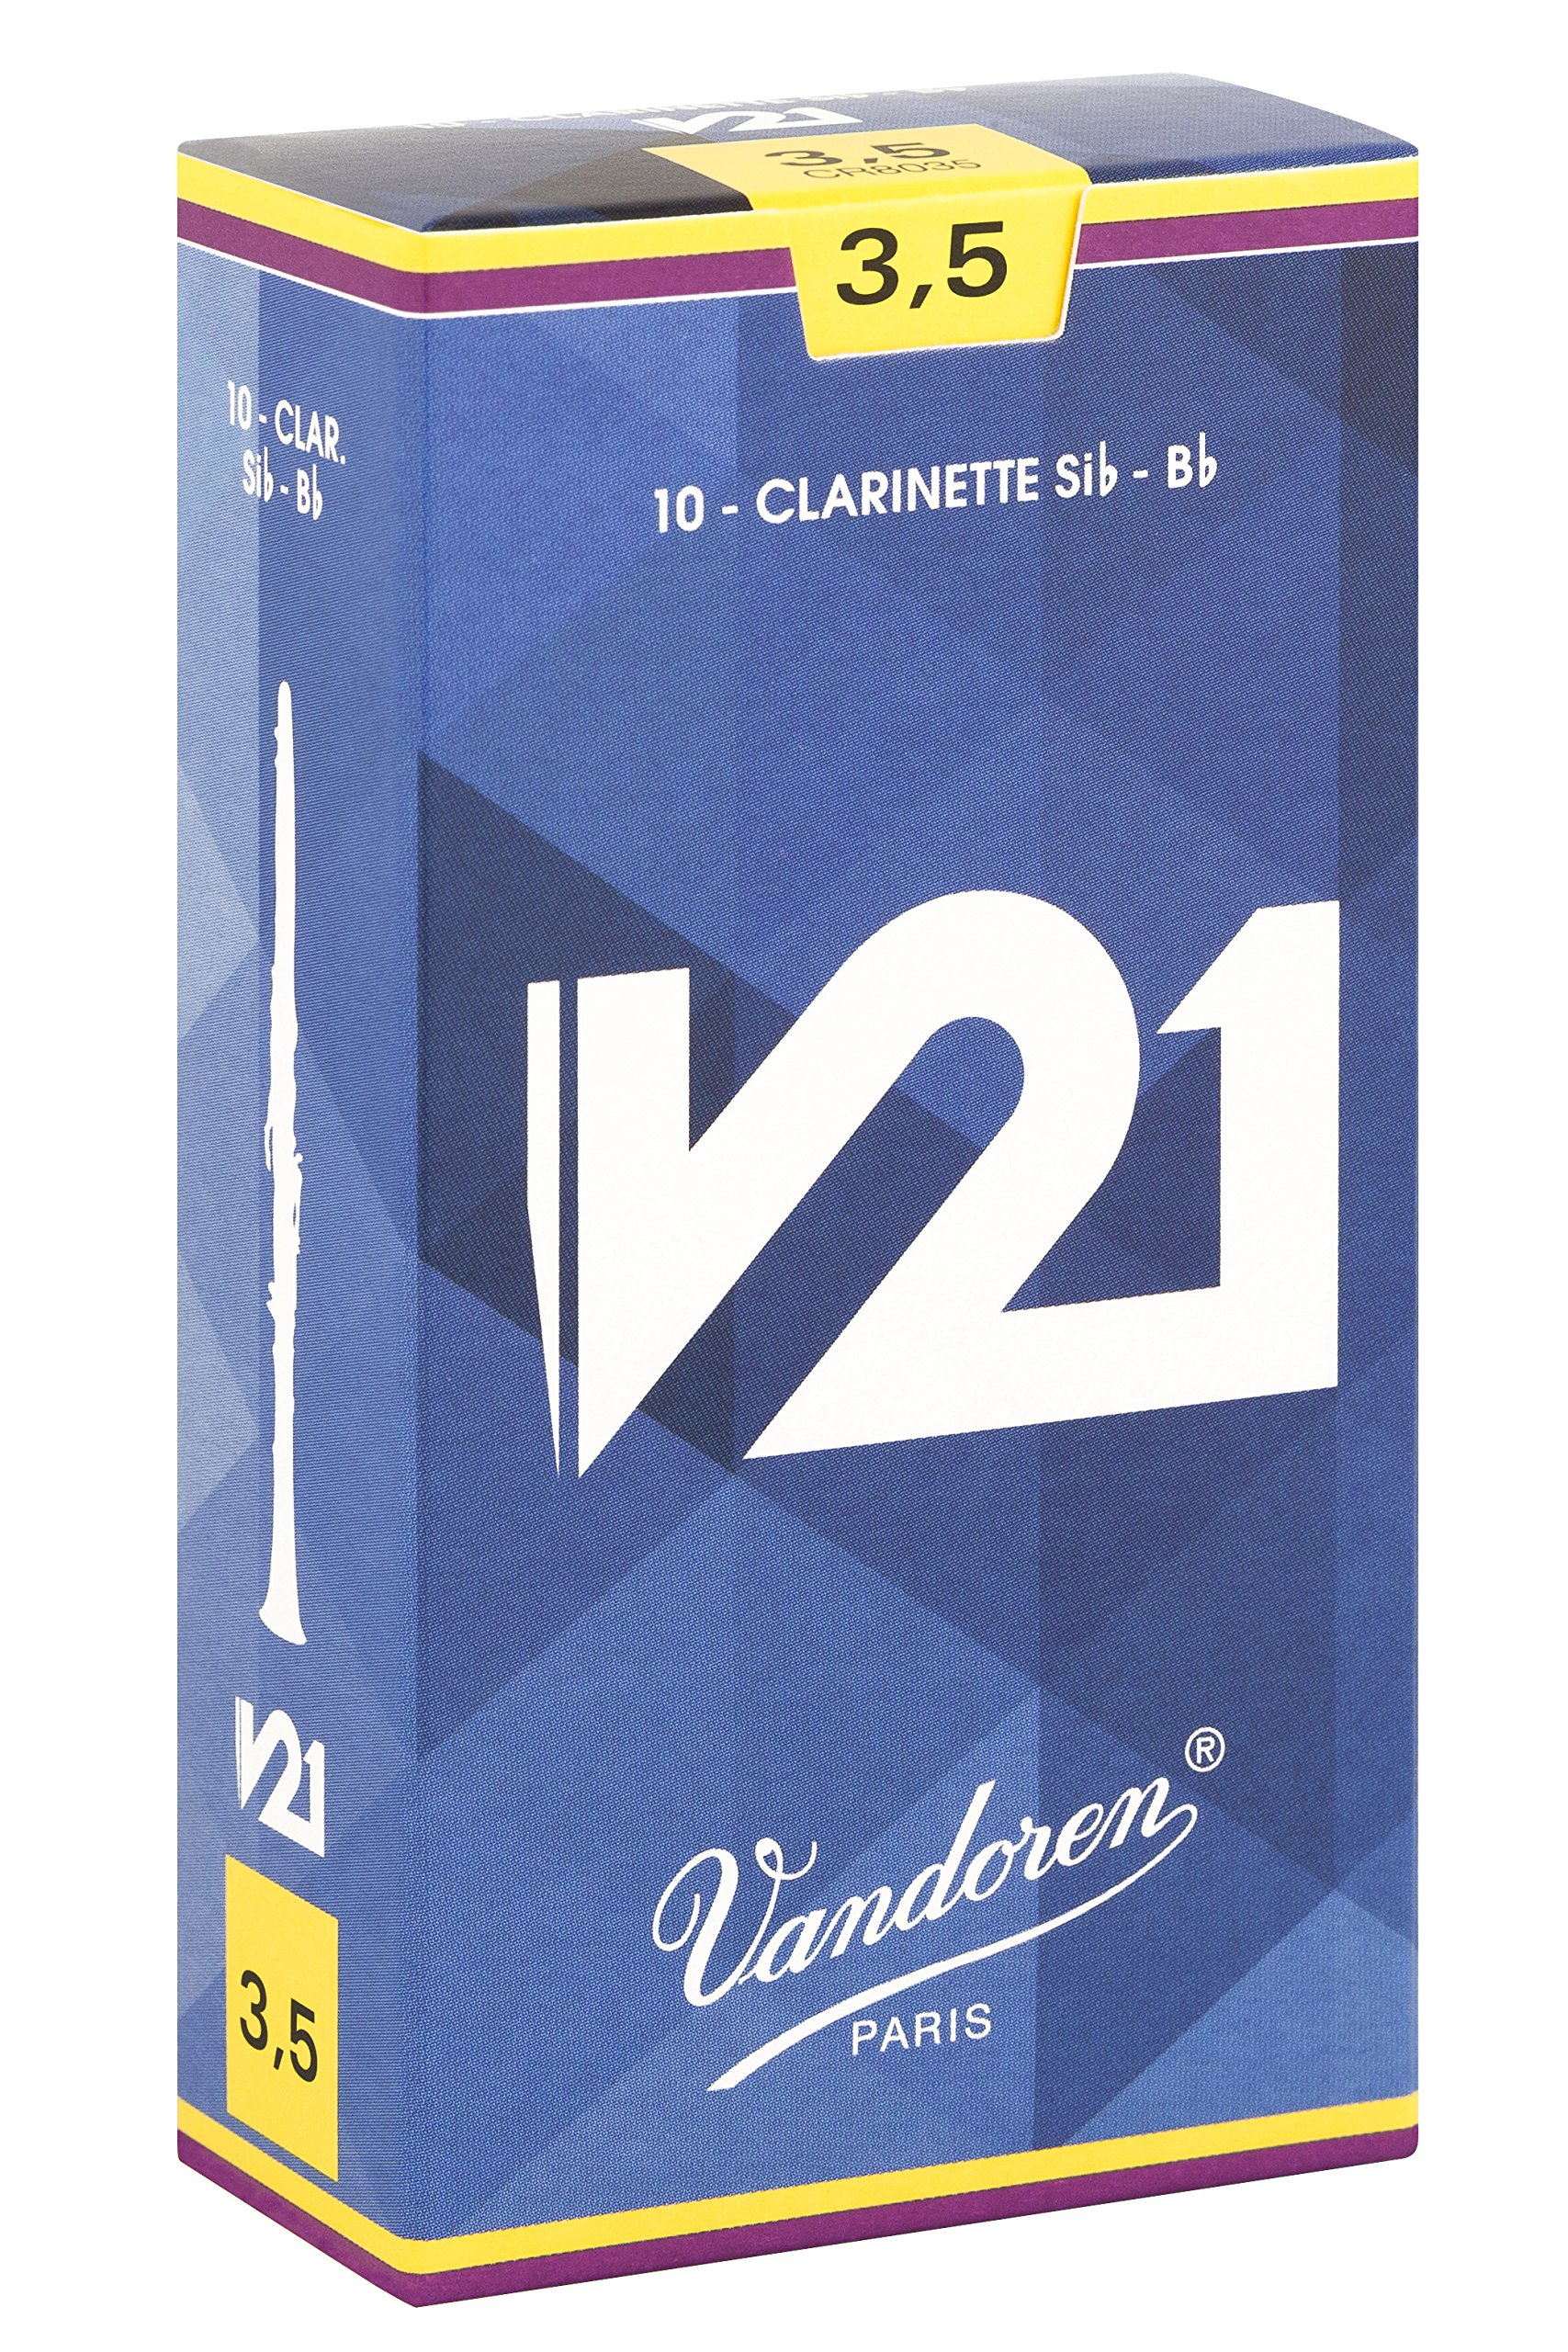 Vandoren CR8035 Bb Clarinet V21 Reeds Strength 3.5; Box of 10 by Vandoren (Image #1)